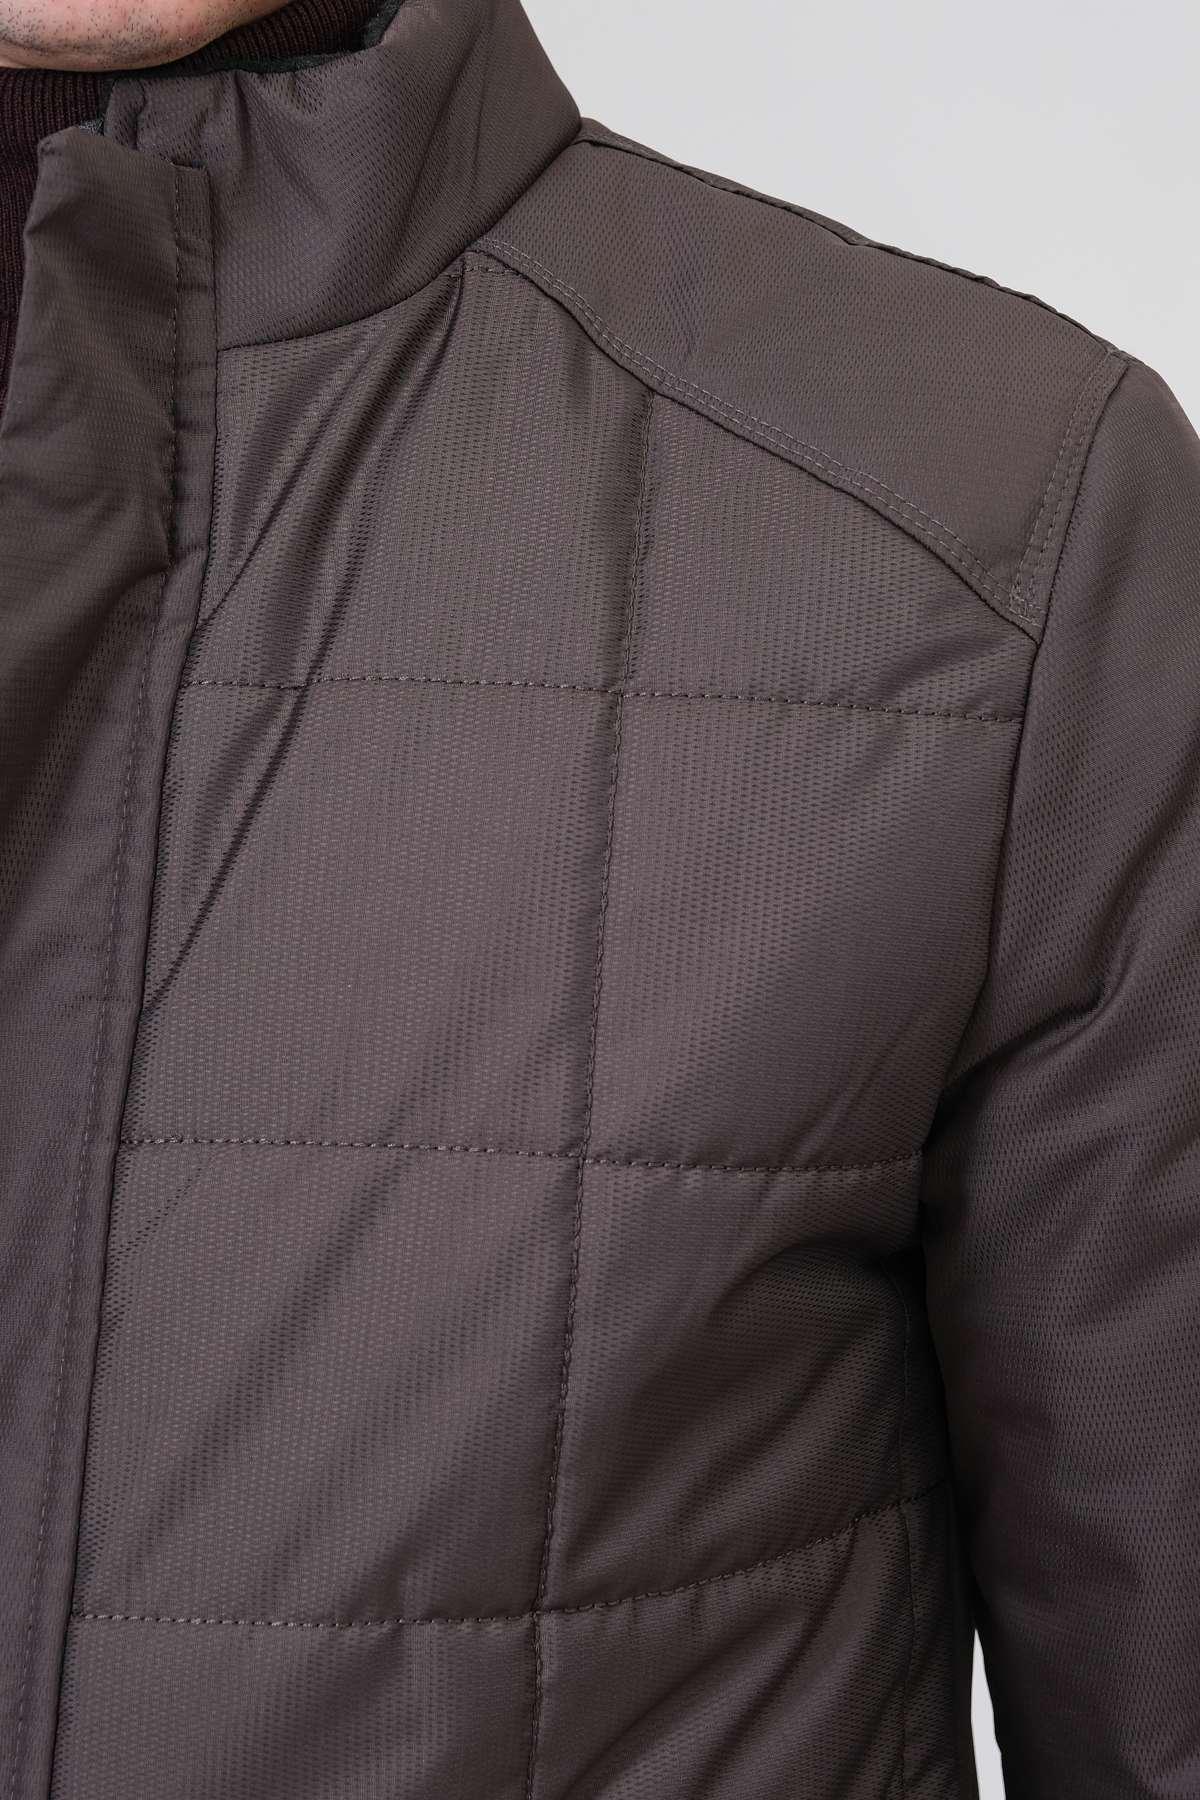 Male fiber filled waterproof kapitöne coats, coat reasonable price